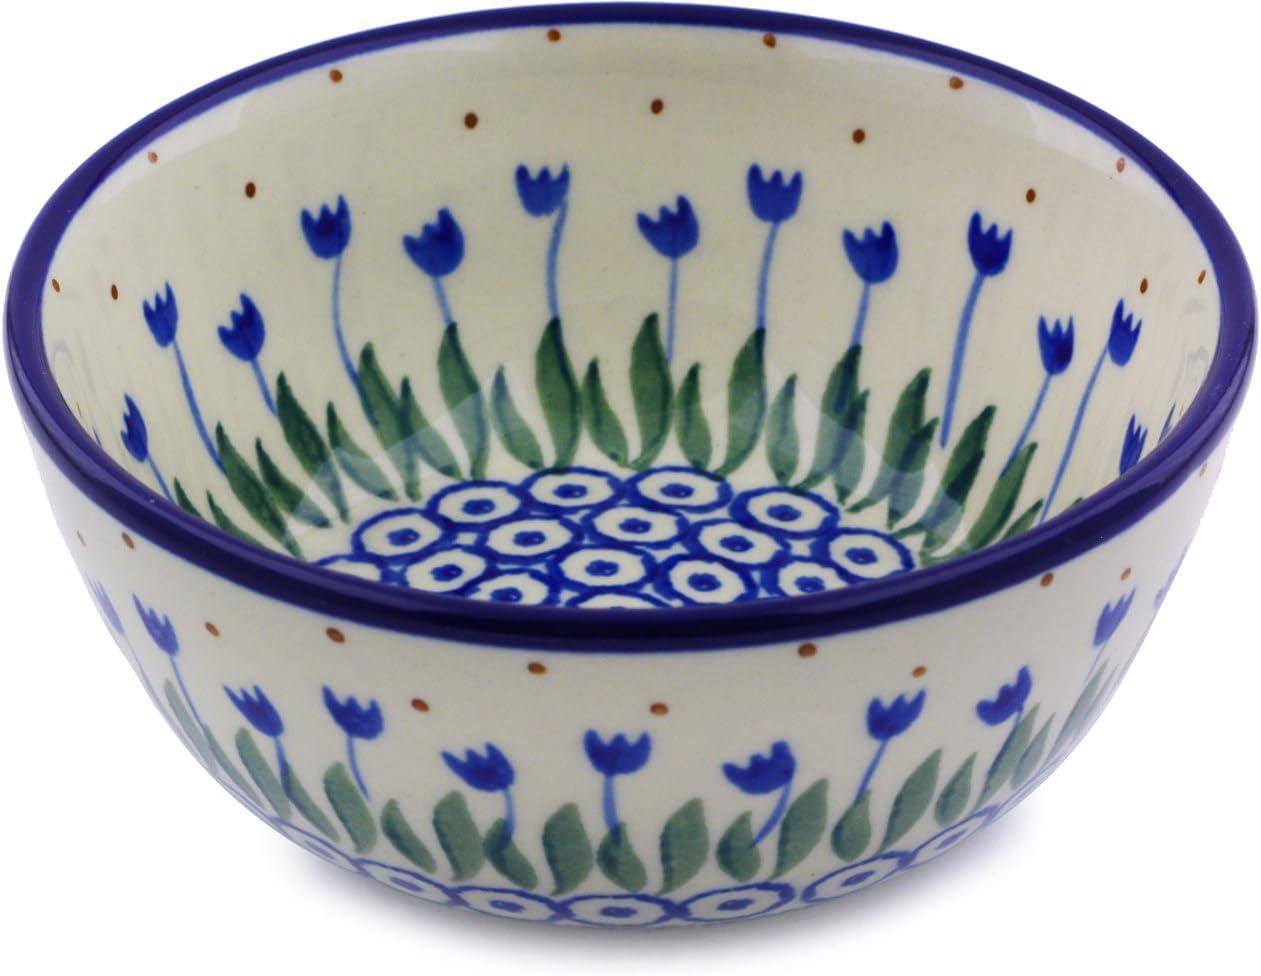 Polish Pottery Bowl 5-inch made by Ceramika Artystyczna (Water Tulip Theme)